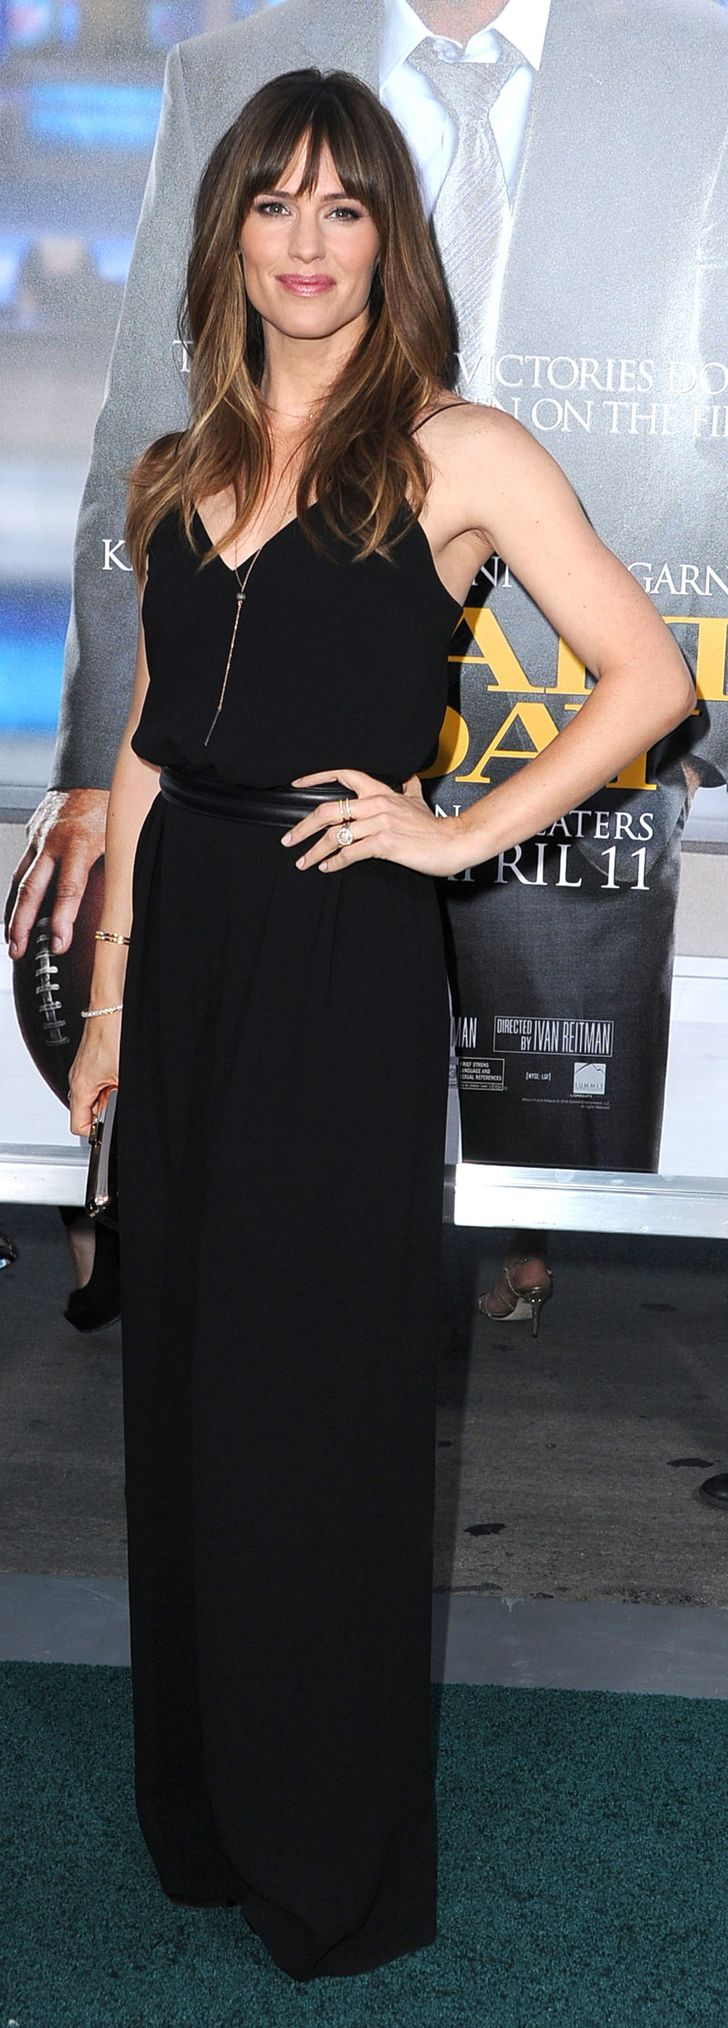 Jennifer Garner in Max Mara at the Draft Day premiere.